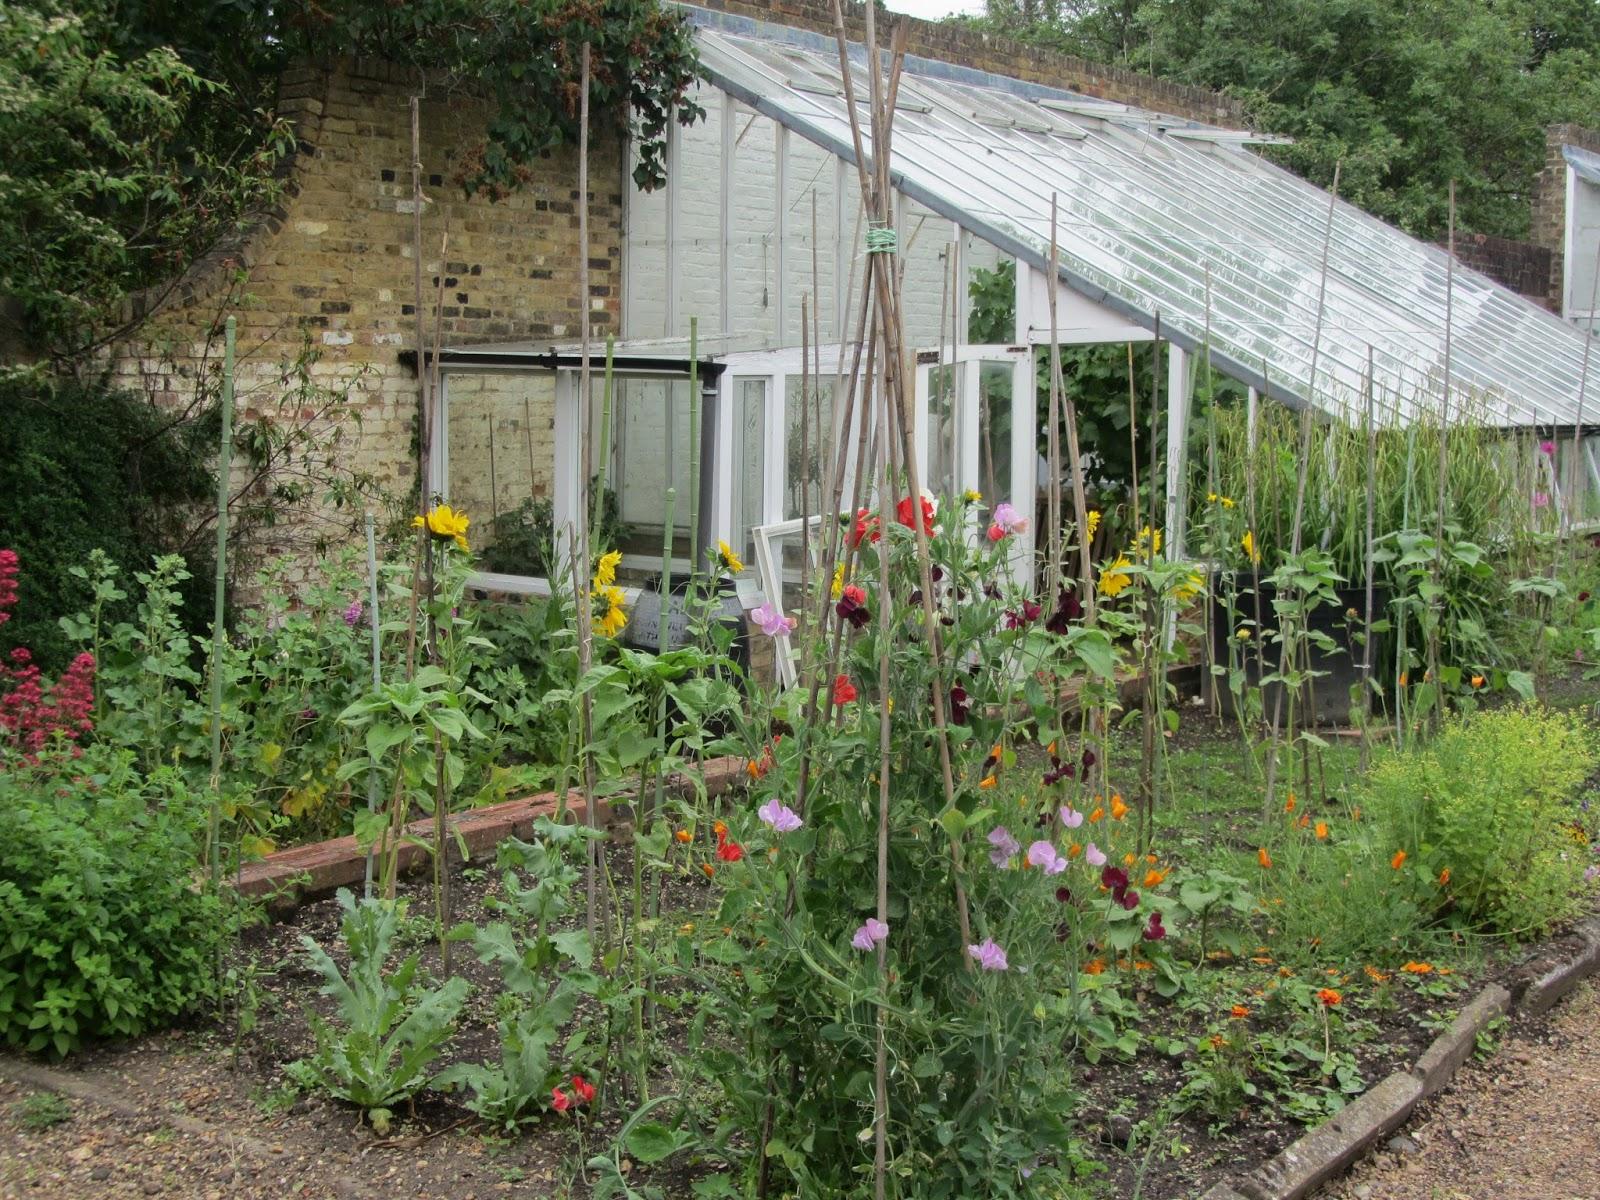 Ham photos rear garden at ormeley lodge - Img_1333 Jpg